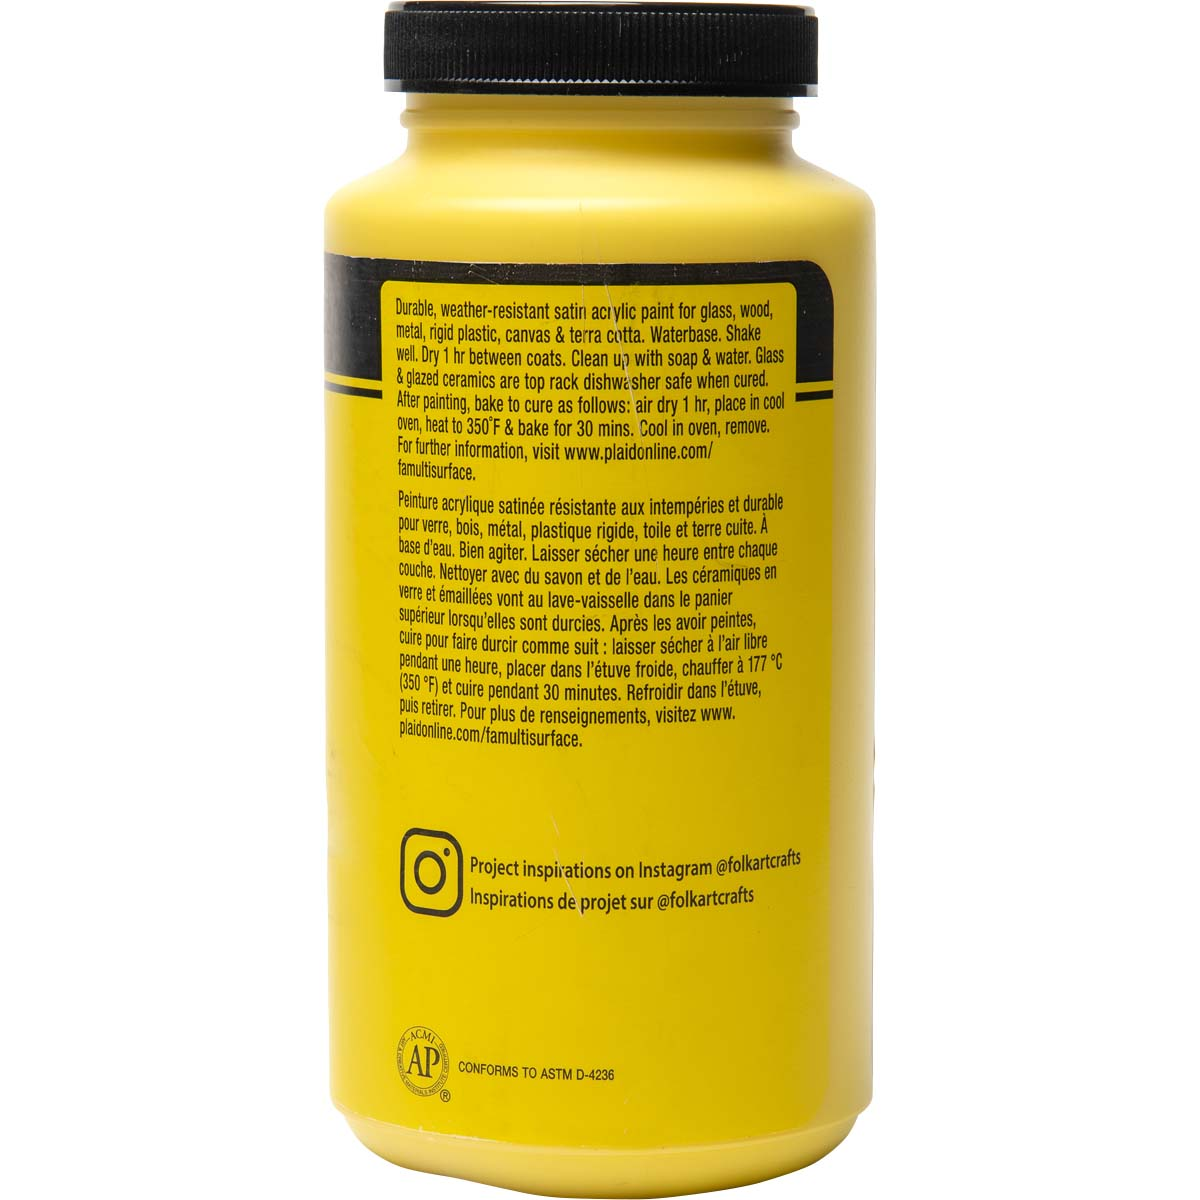 FolkArt ® Multi-Surface Satin Acrylic Paints - Daffodil Yellow, 16 oz.